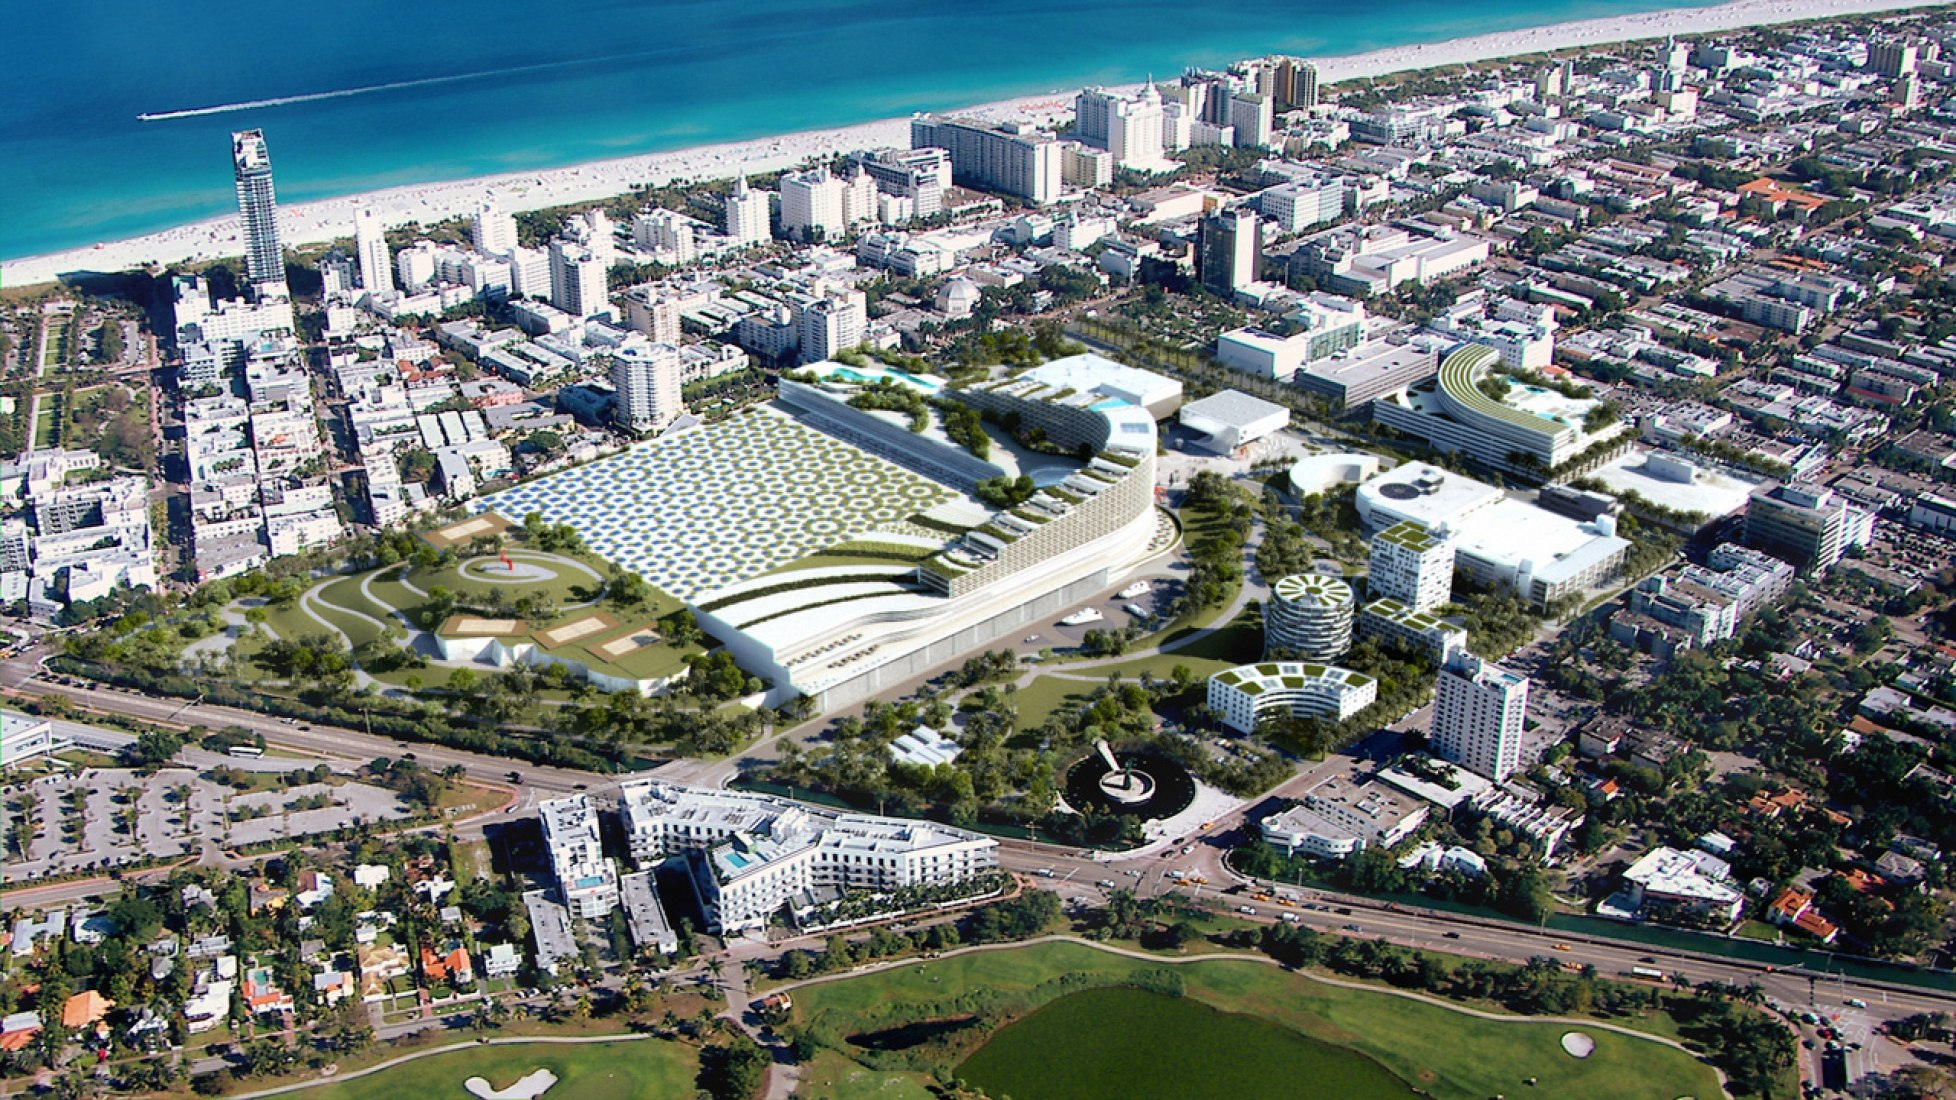 Vista de pajaro. Miami Beach Convention Center. Imagen cortesía de OMA.